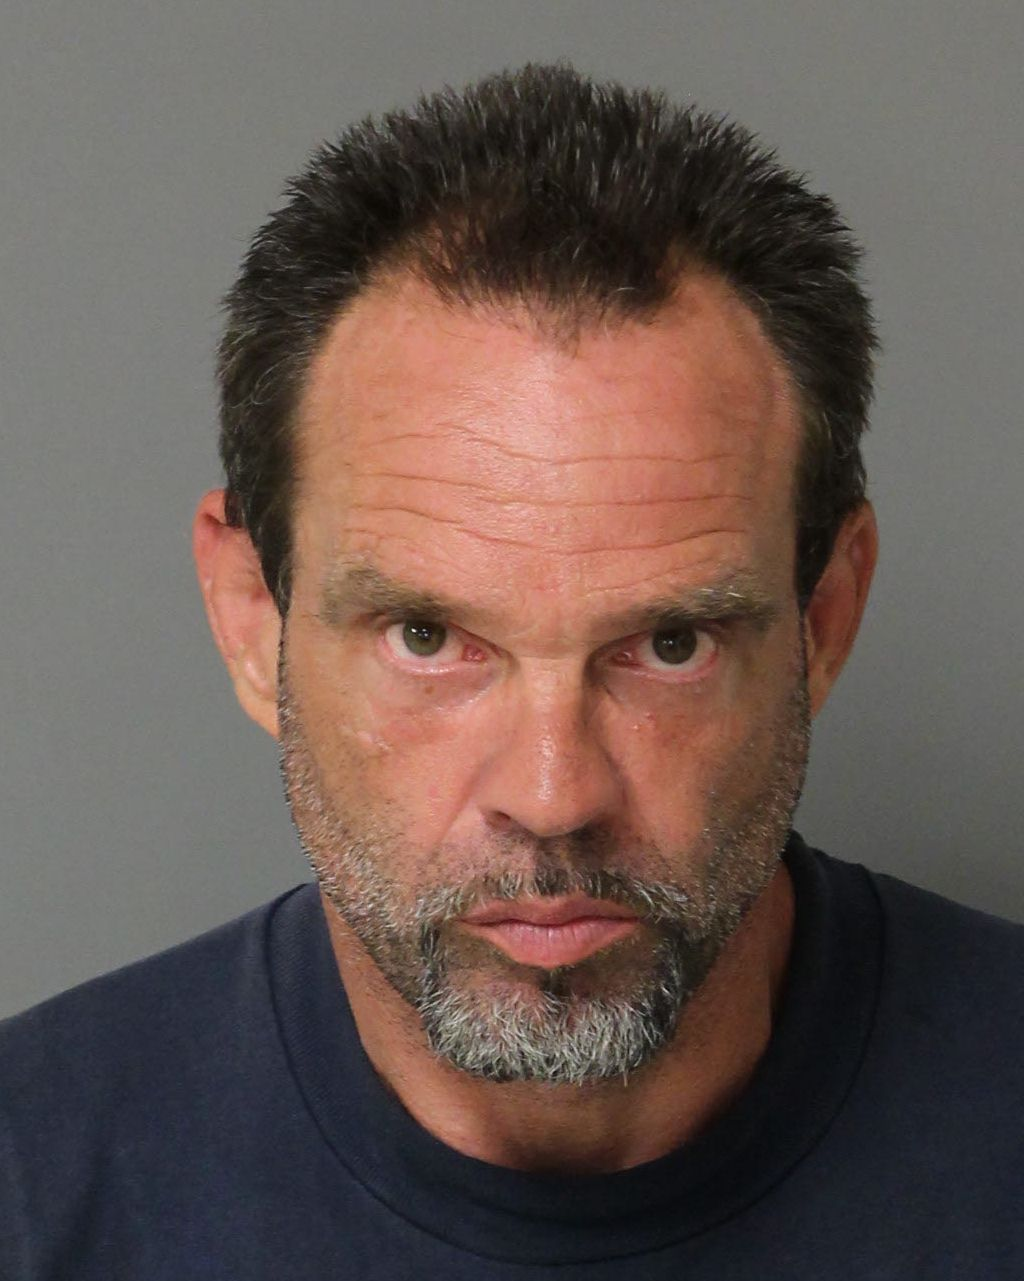 KURZ MICHAEL EUGENE Mugshot / County Arrests / Wake County Arrests